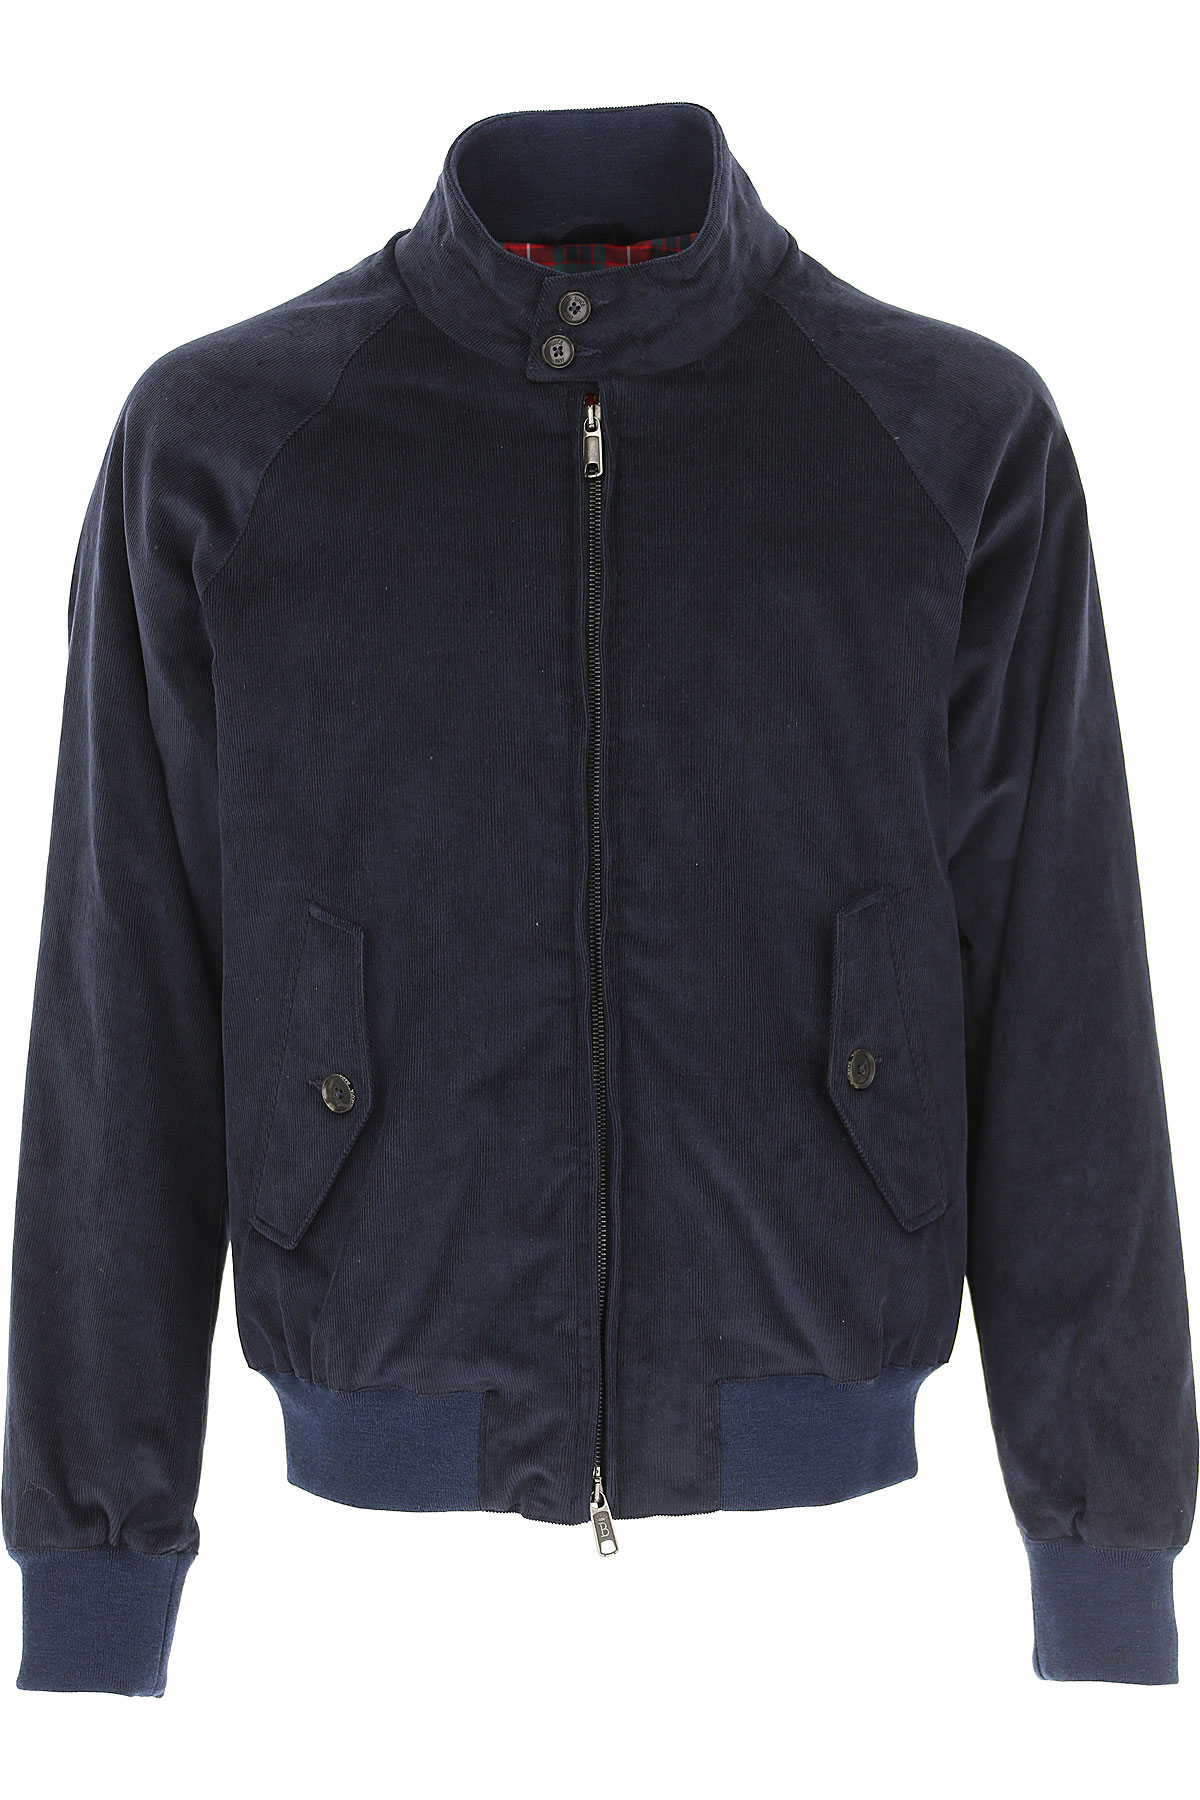 Image of Baracuta Jacket for Men, navy, Cotton, 2017, UK 36 - IT 46 UK 38 - IT 48 UK 40 - IT 50 UK 42 - IT 52 UK 44 - IT 54 UK 46 - IT 56